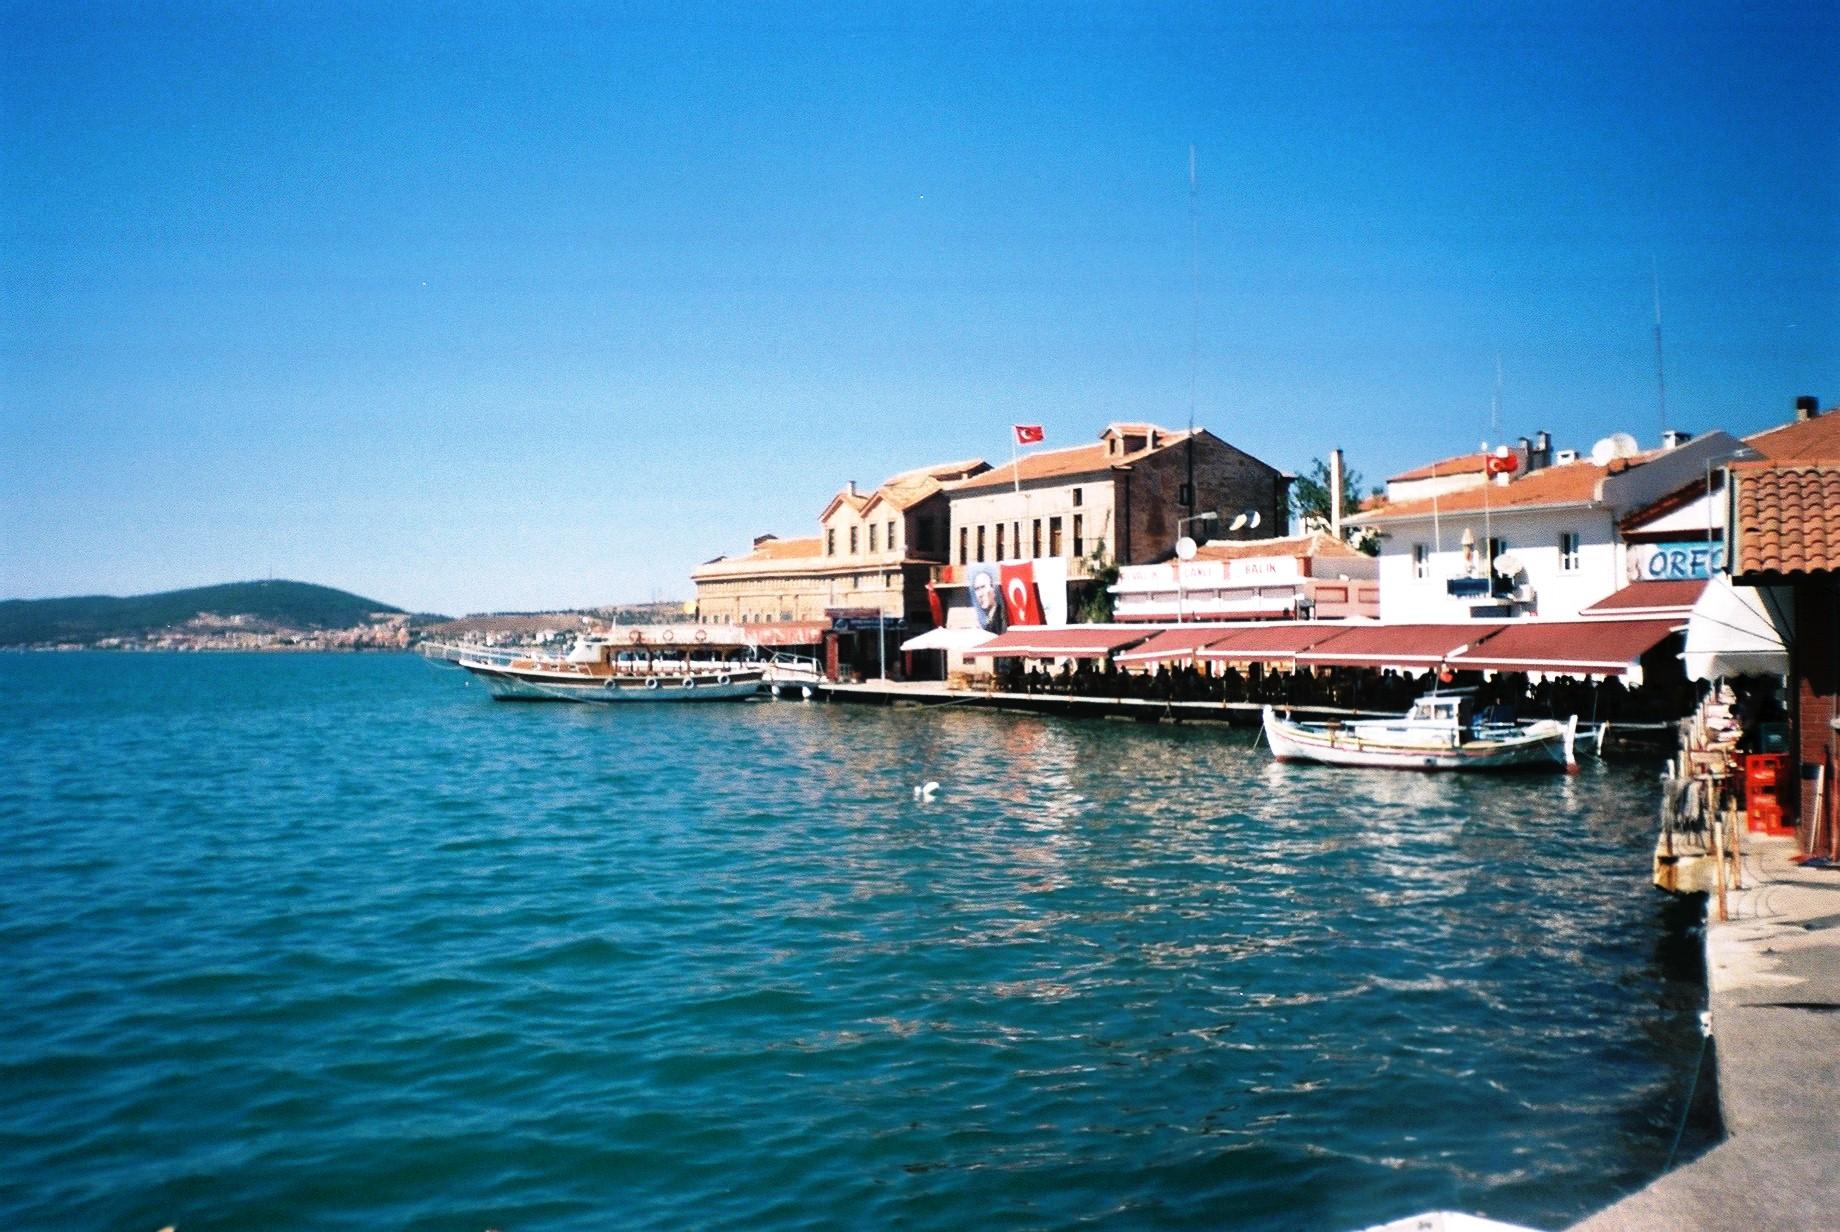 File:Ayvalik seafront.jpg - Wikipedia